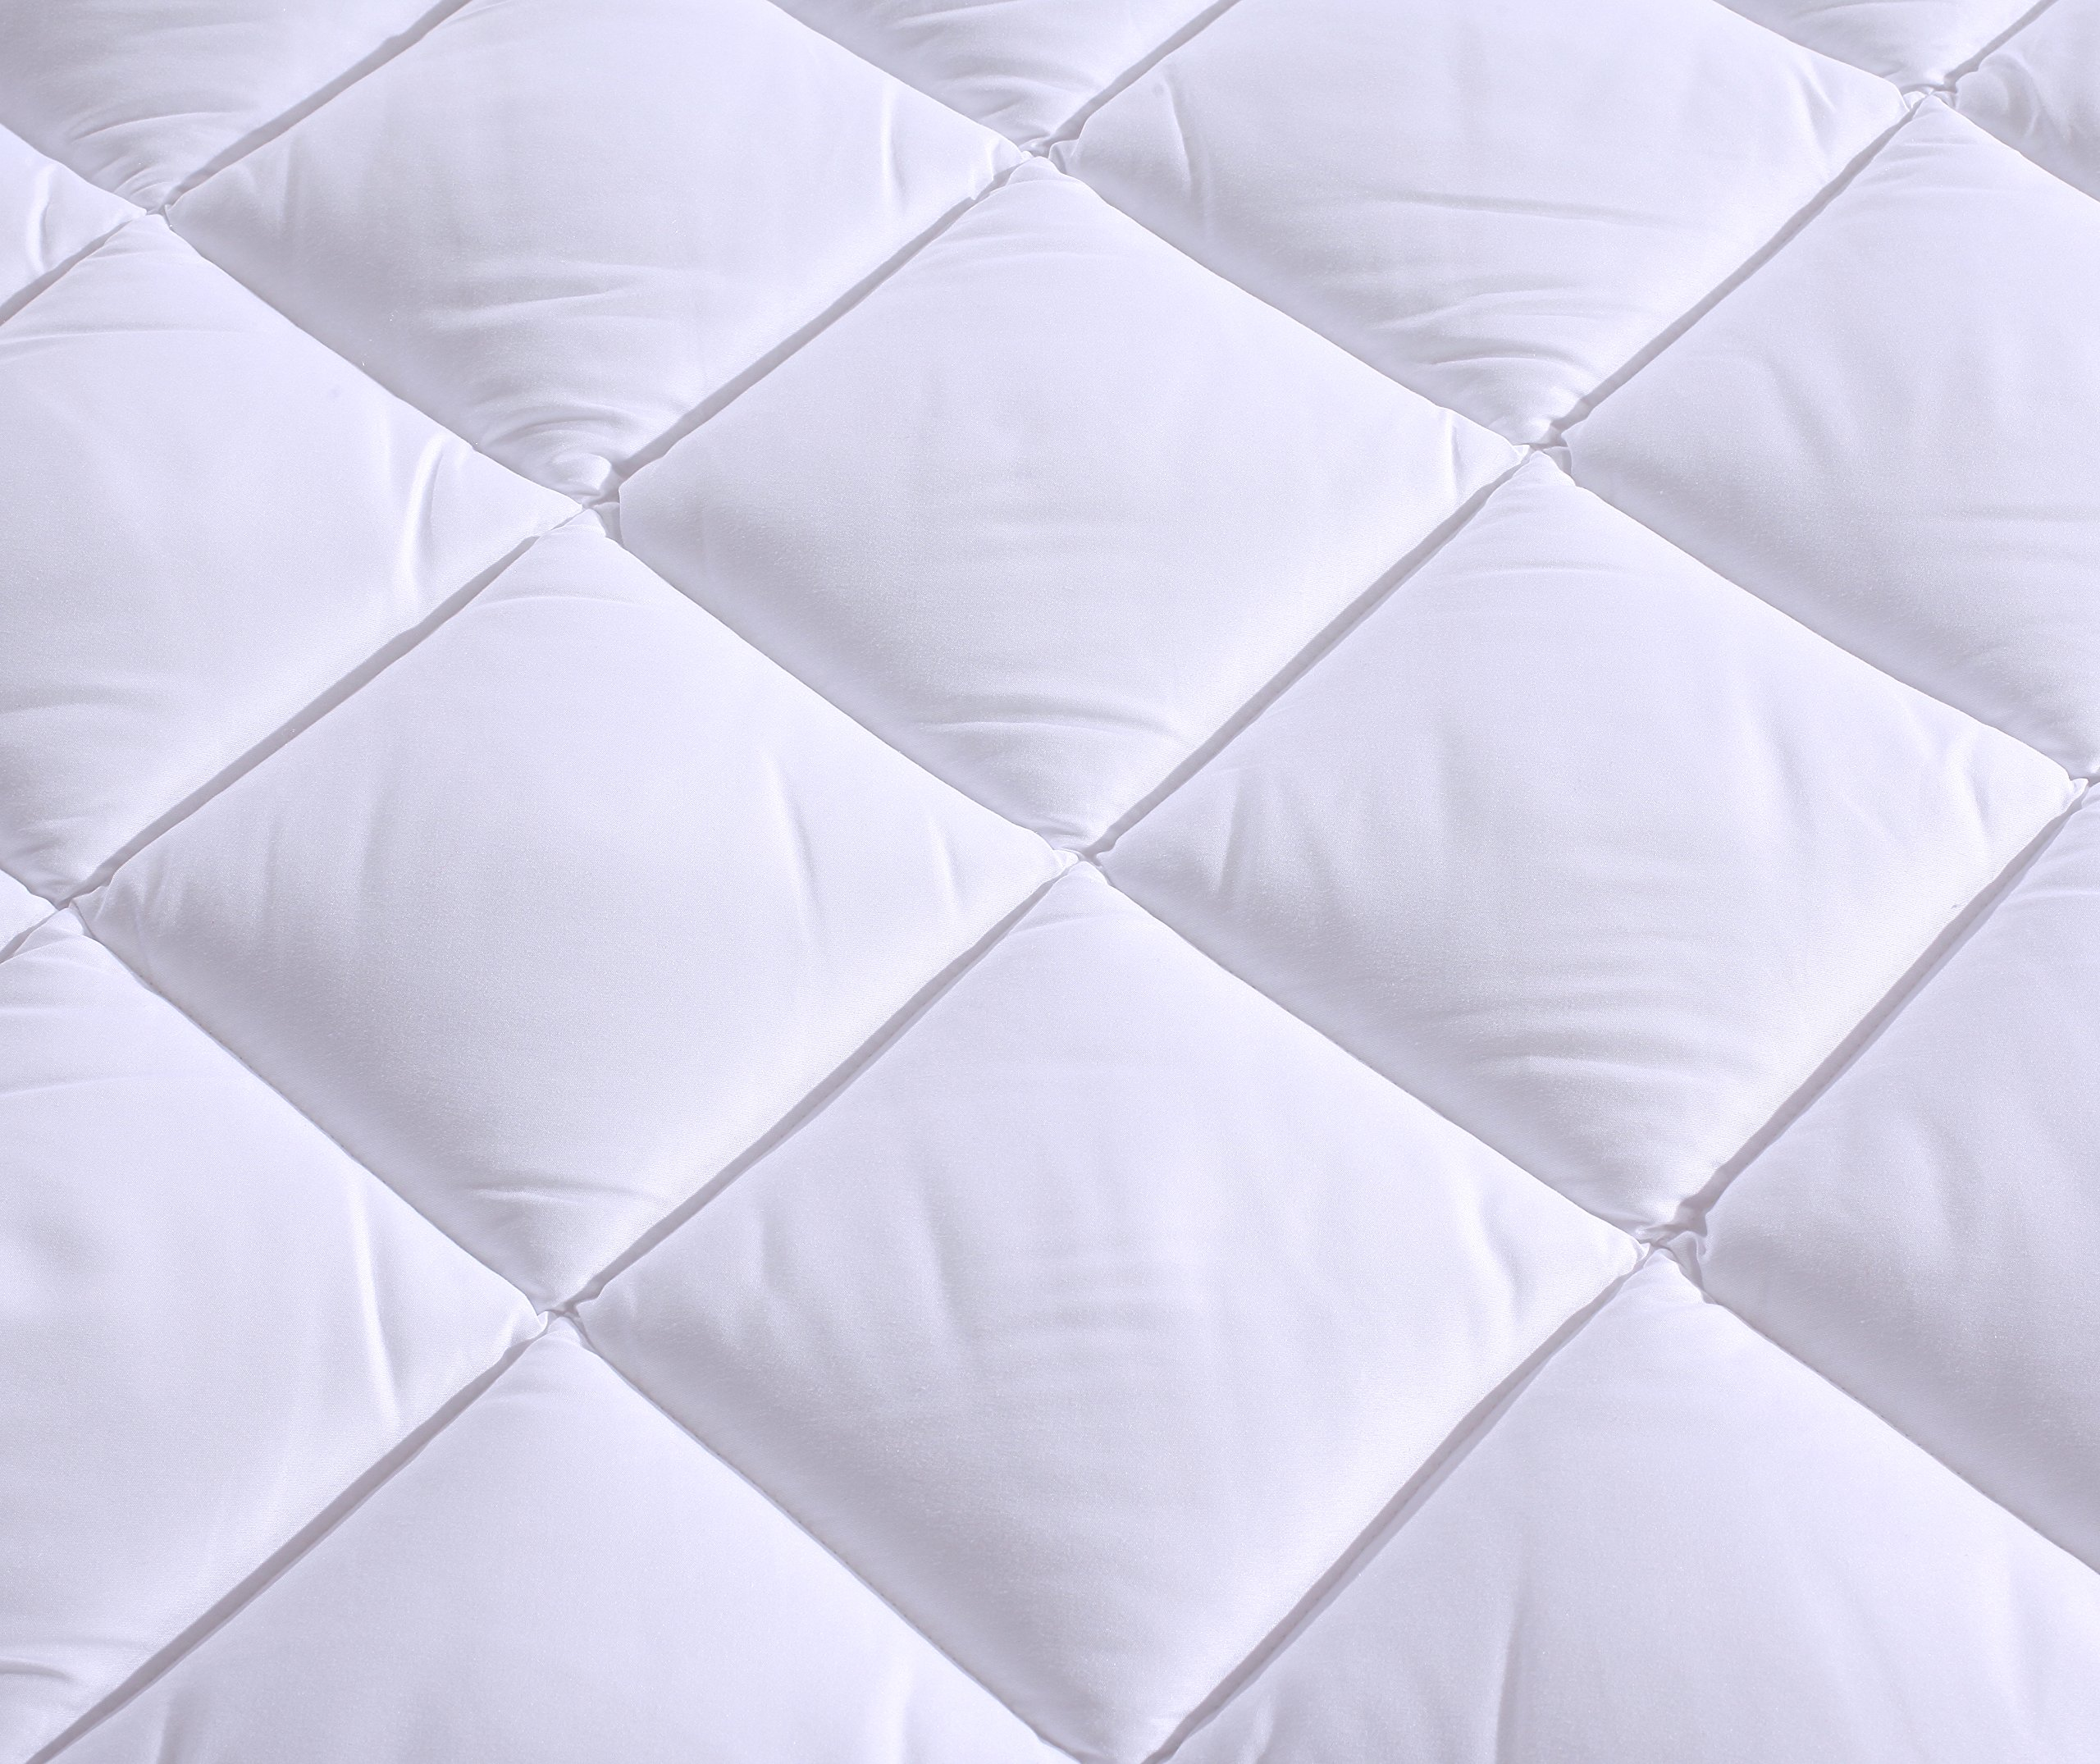 Everest Premium Plus Mattress Pad HypoallergenicQuilted Mattress Topper, Deep Pocket, Stretch to Fit, Microfiber,Extra Plush (Sleeper Sofa Compressed, Sleeper Sofa Full (54'' x 72'' + 12'' depth) 15oz)